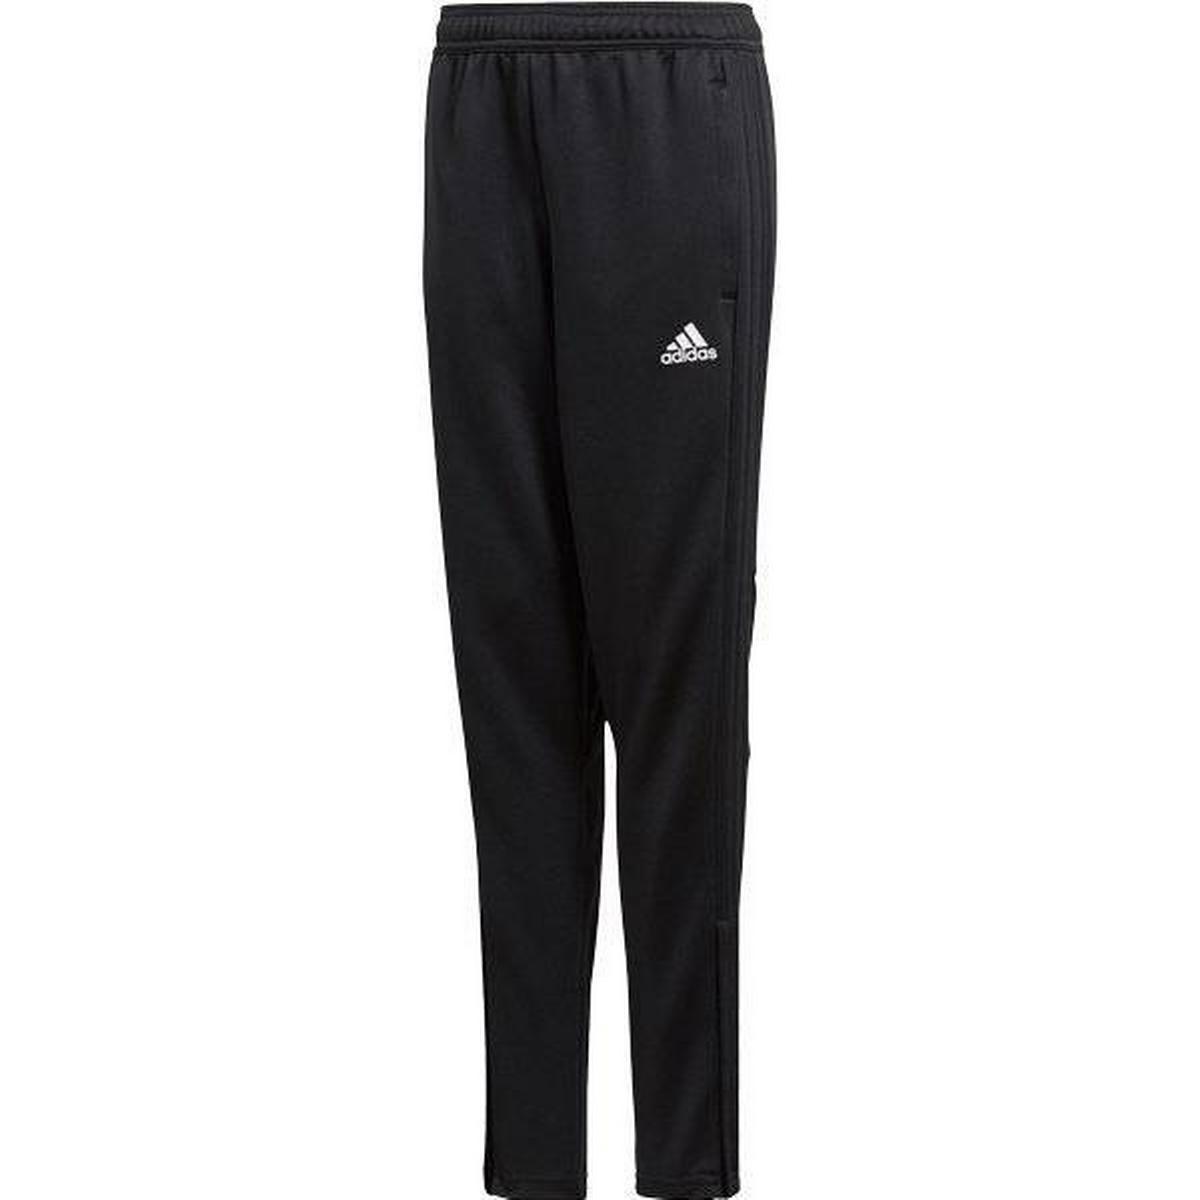 Adidas Snøre Sportstøj Sammenlign priser hos PriceRunner